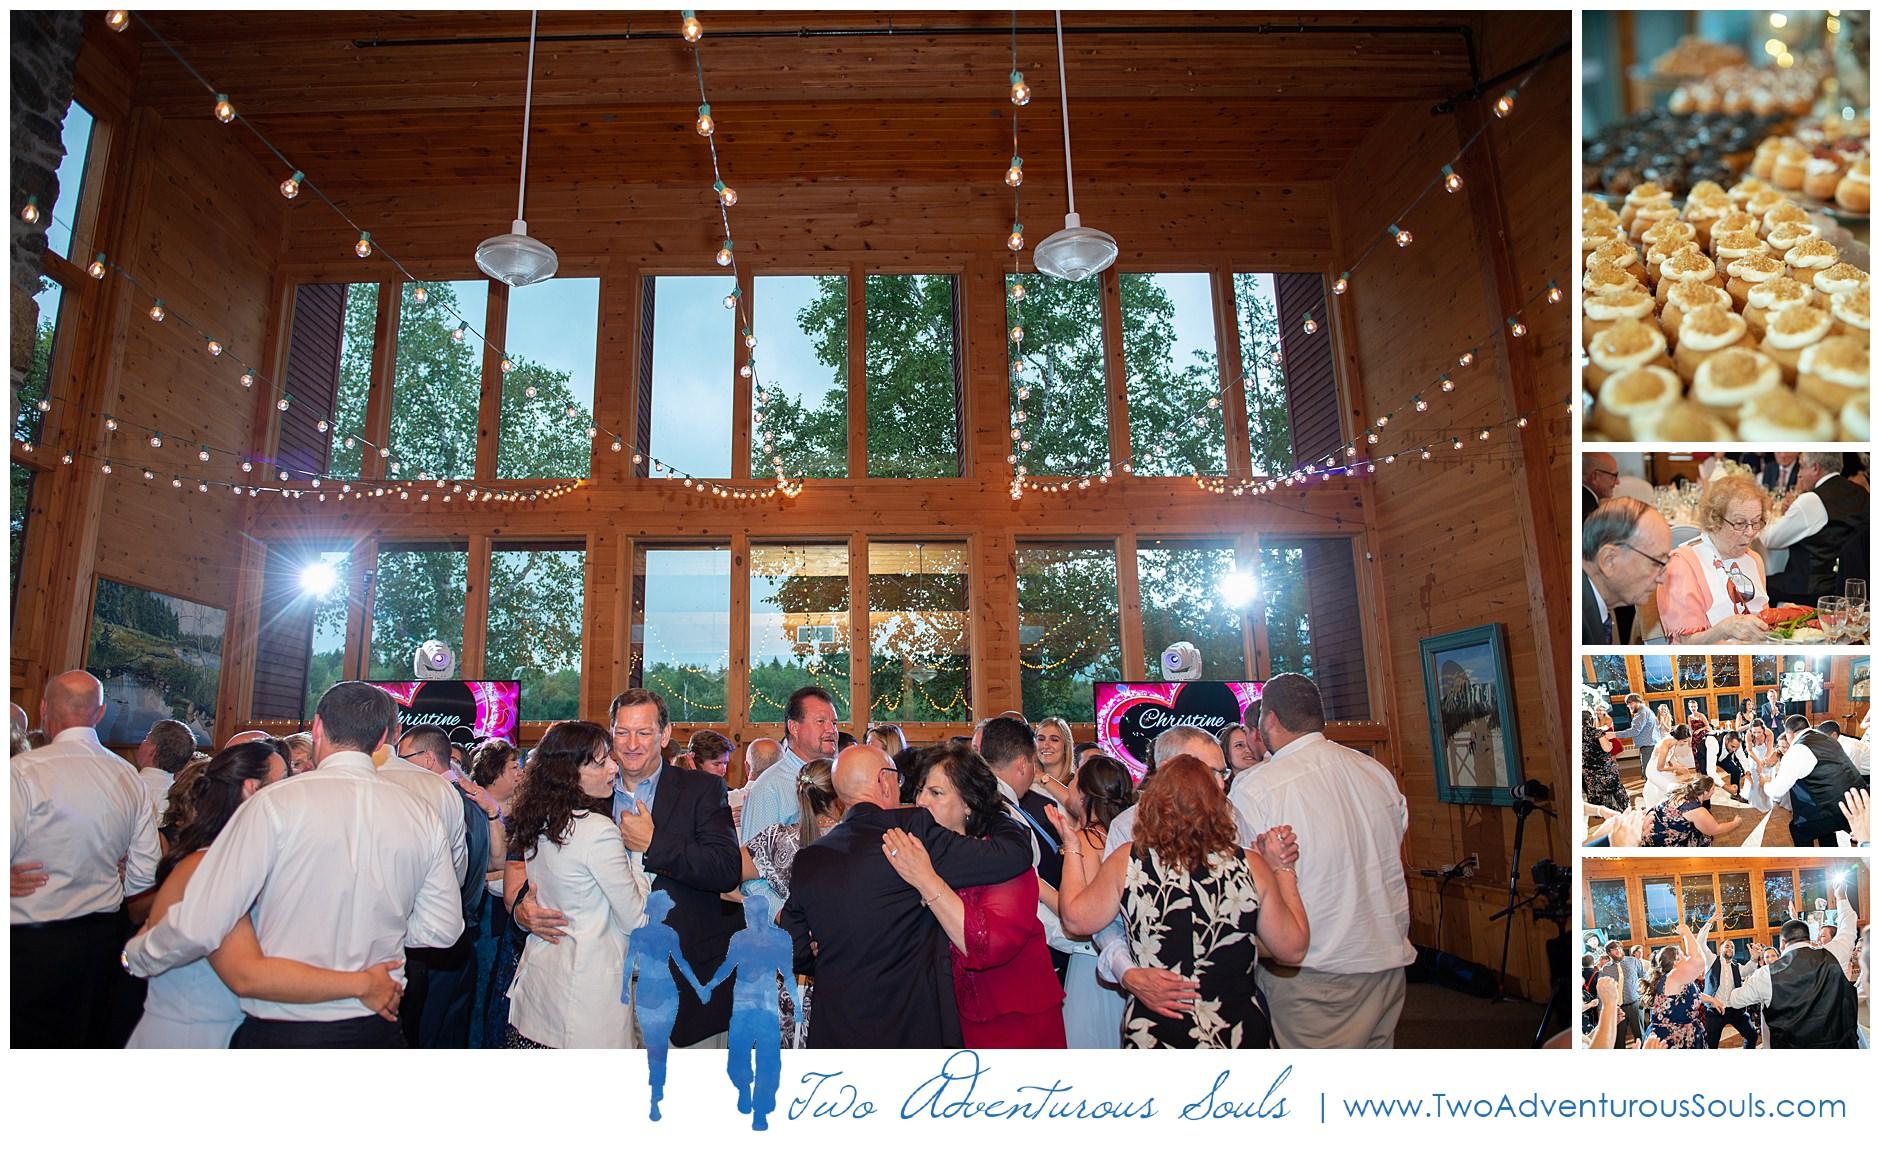 Sugarloaf Outdoor Center Wedding Photographers, Destination Wedding Photographers, Two Adventurous Souls-081719_0056.jpg